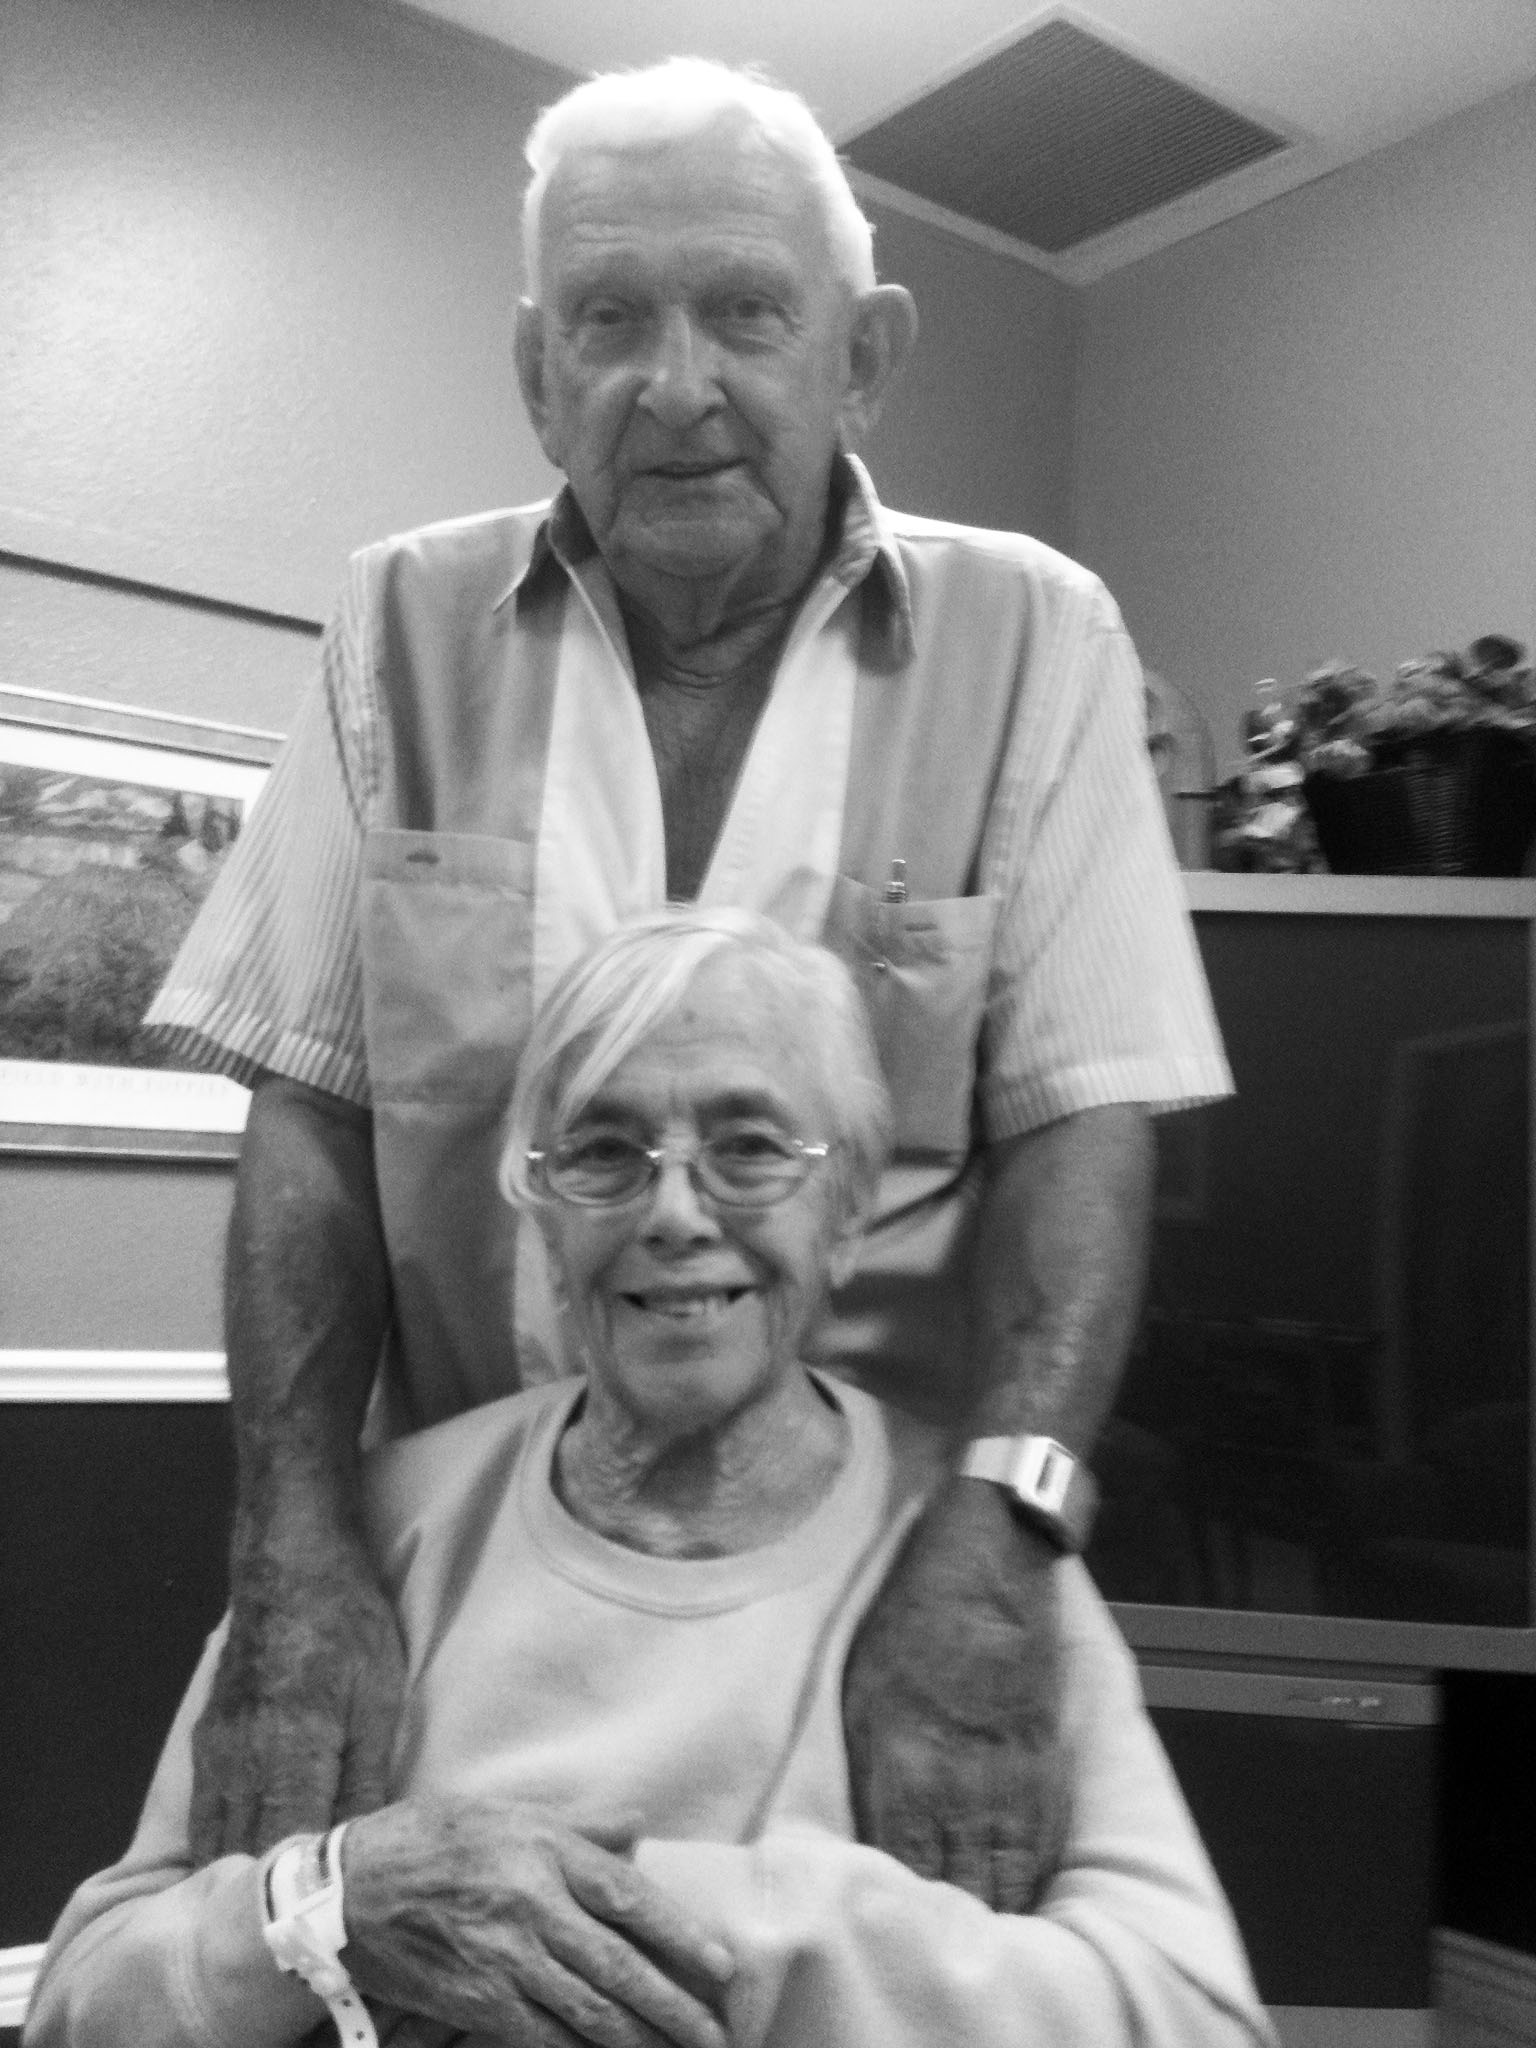 Margie and Lyle Ekstrom